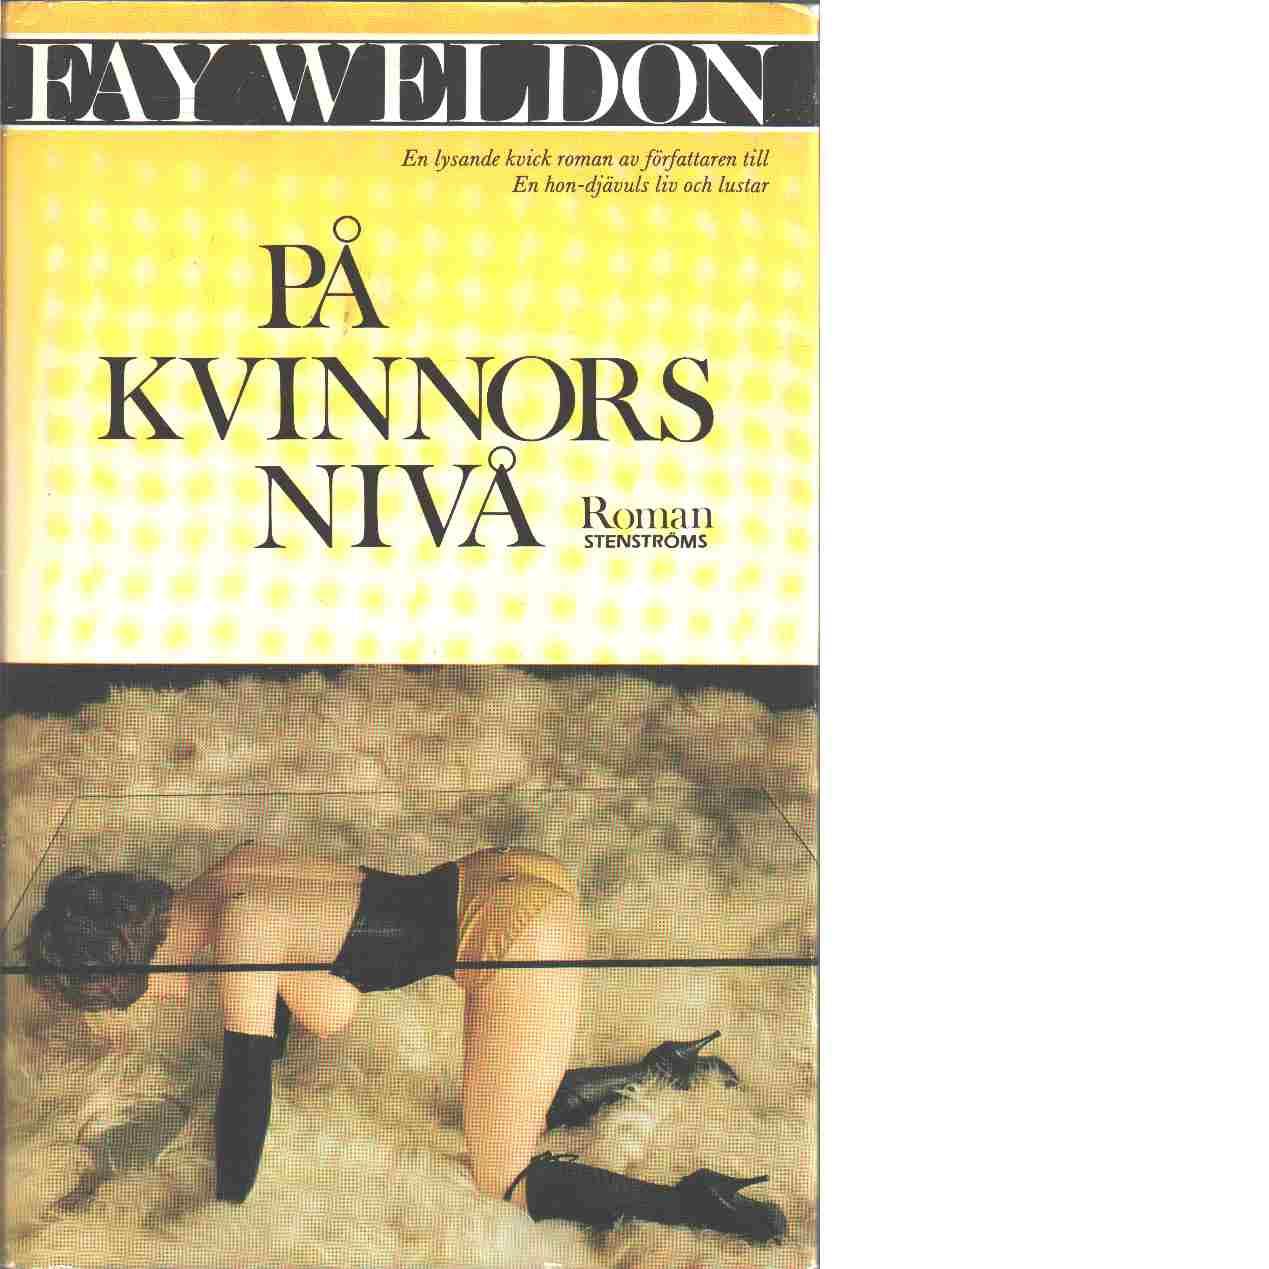 På kvinnors nivå - Weldon, Fay